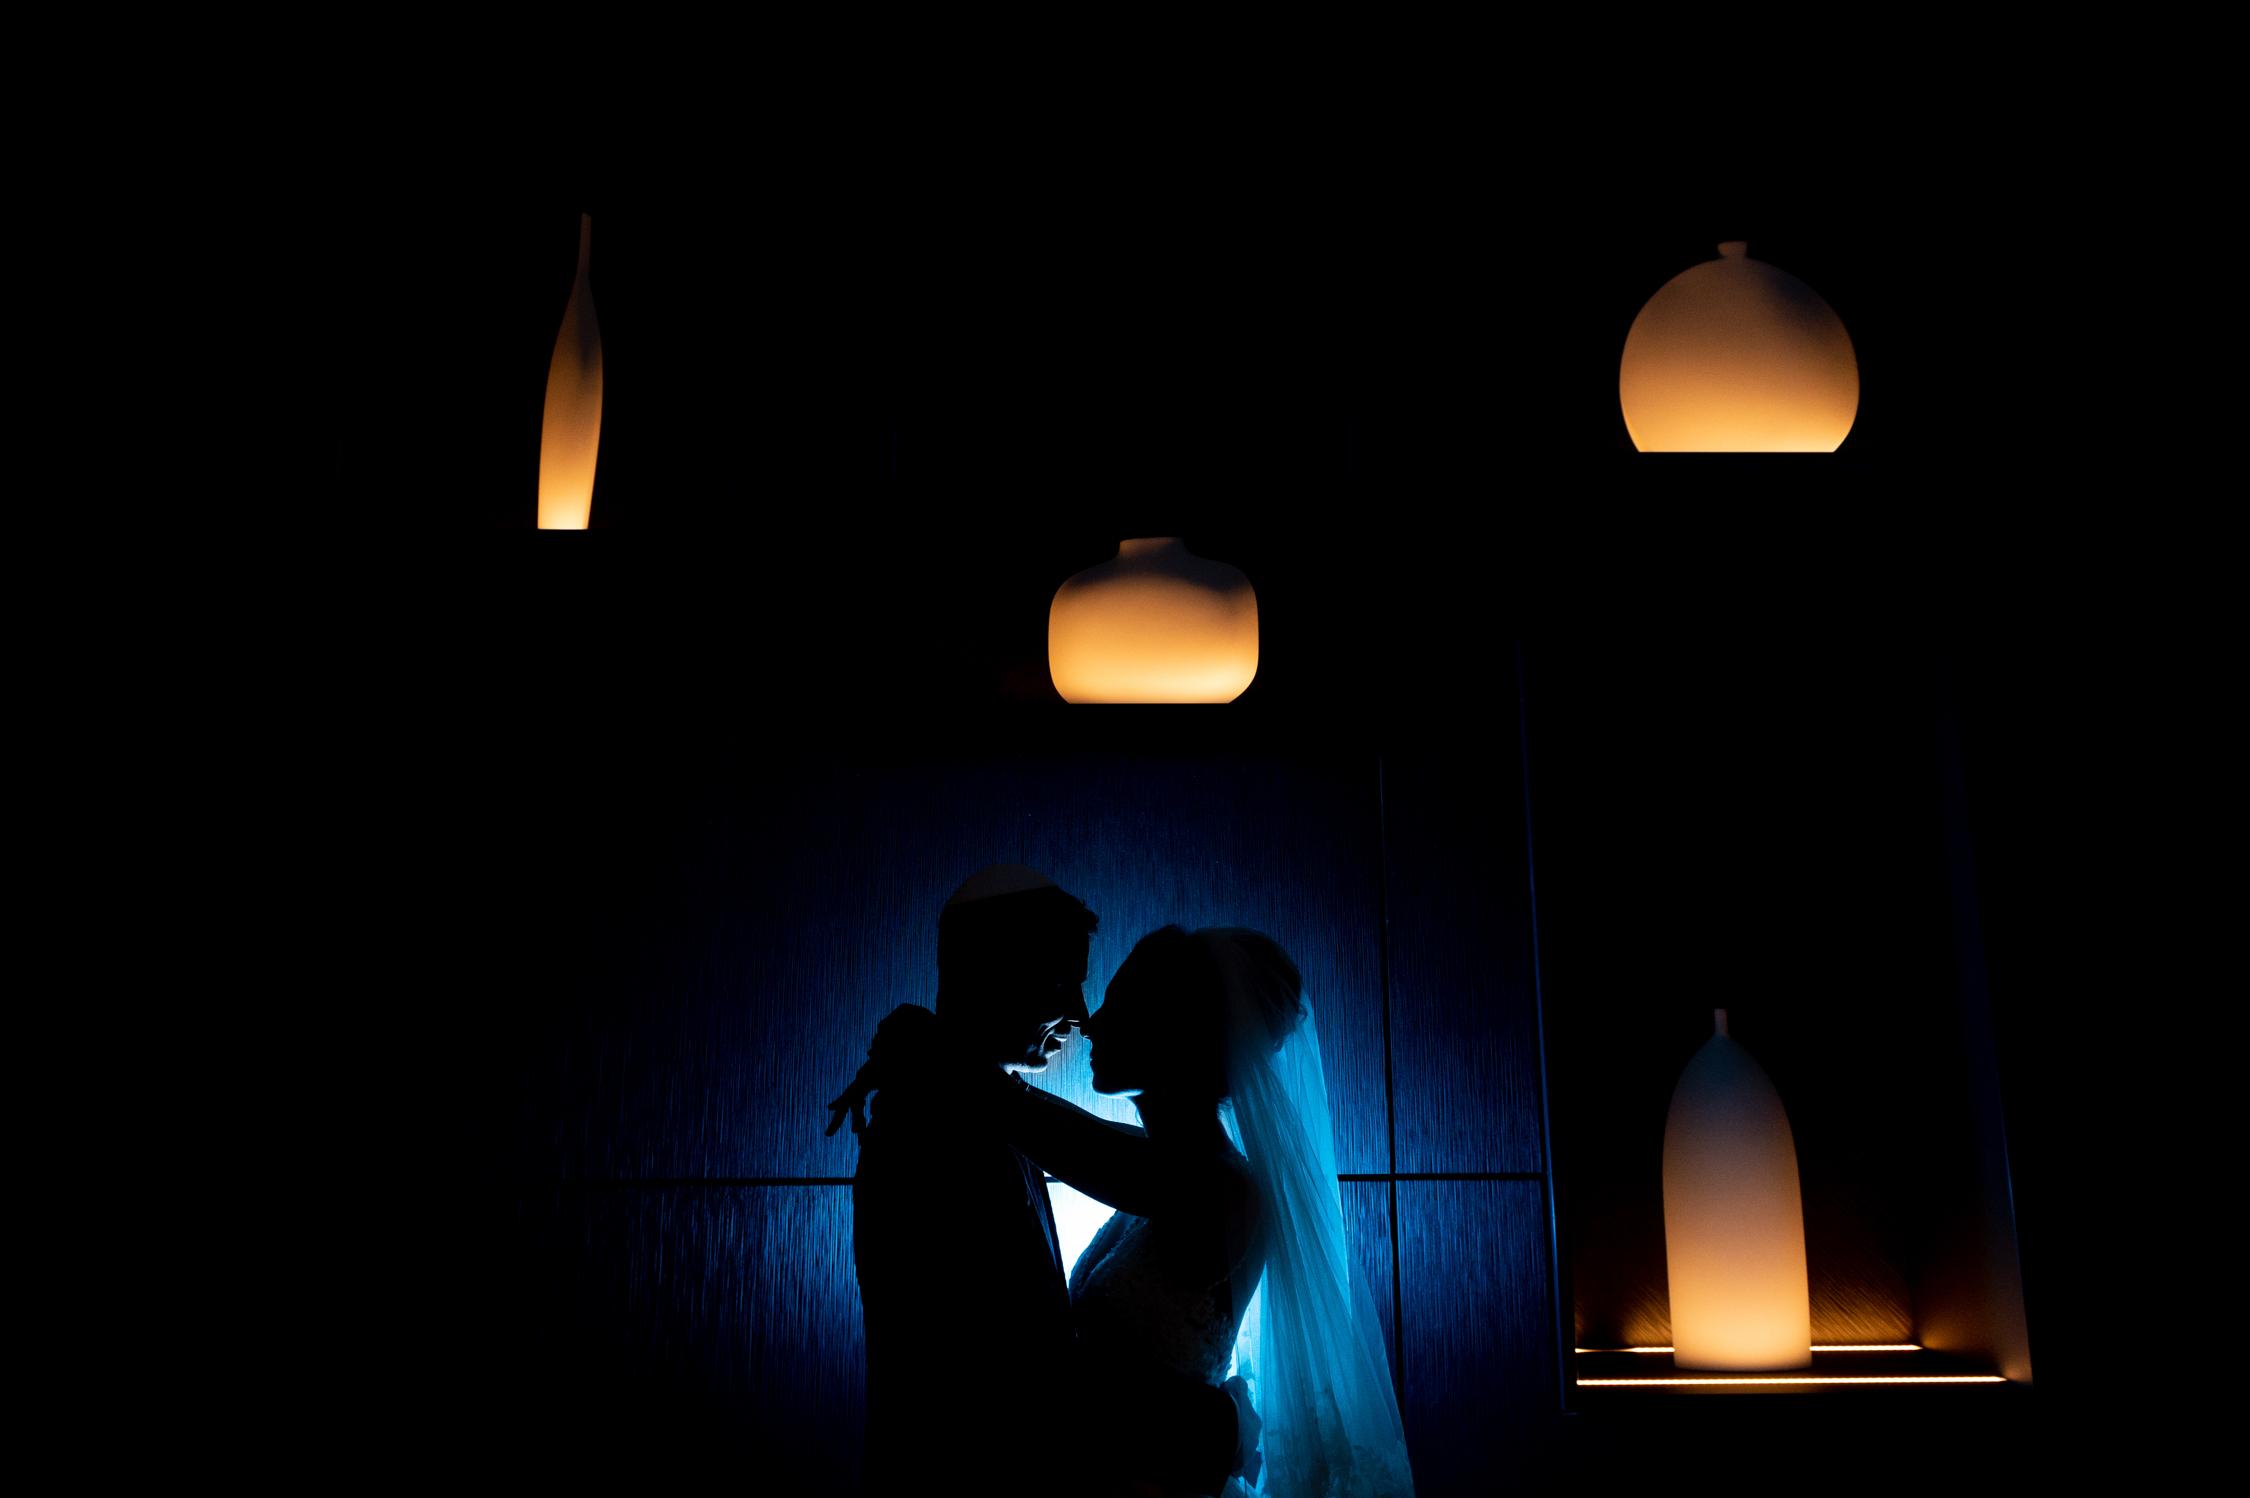 meilleur photographe cameraman mariage lyon rhone geneve,Photographe Book Mariage